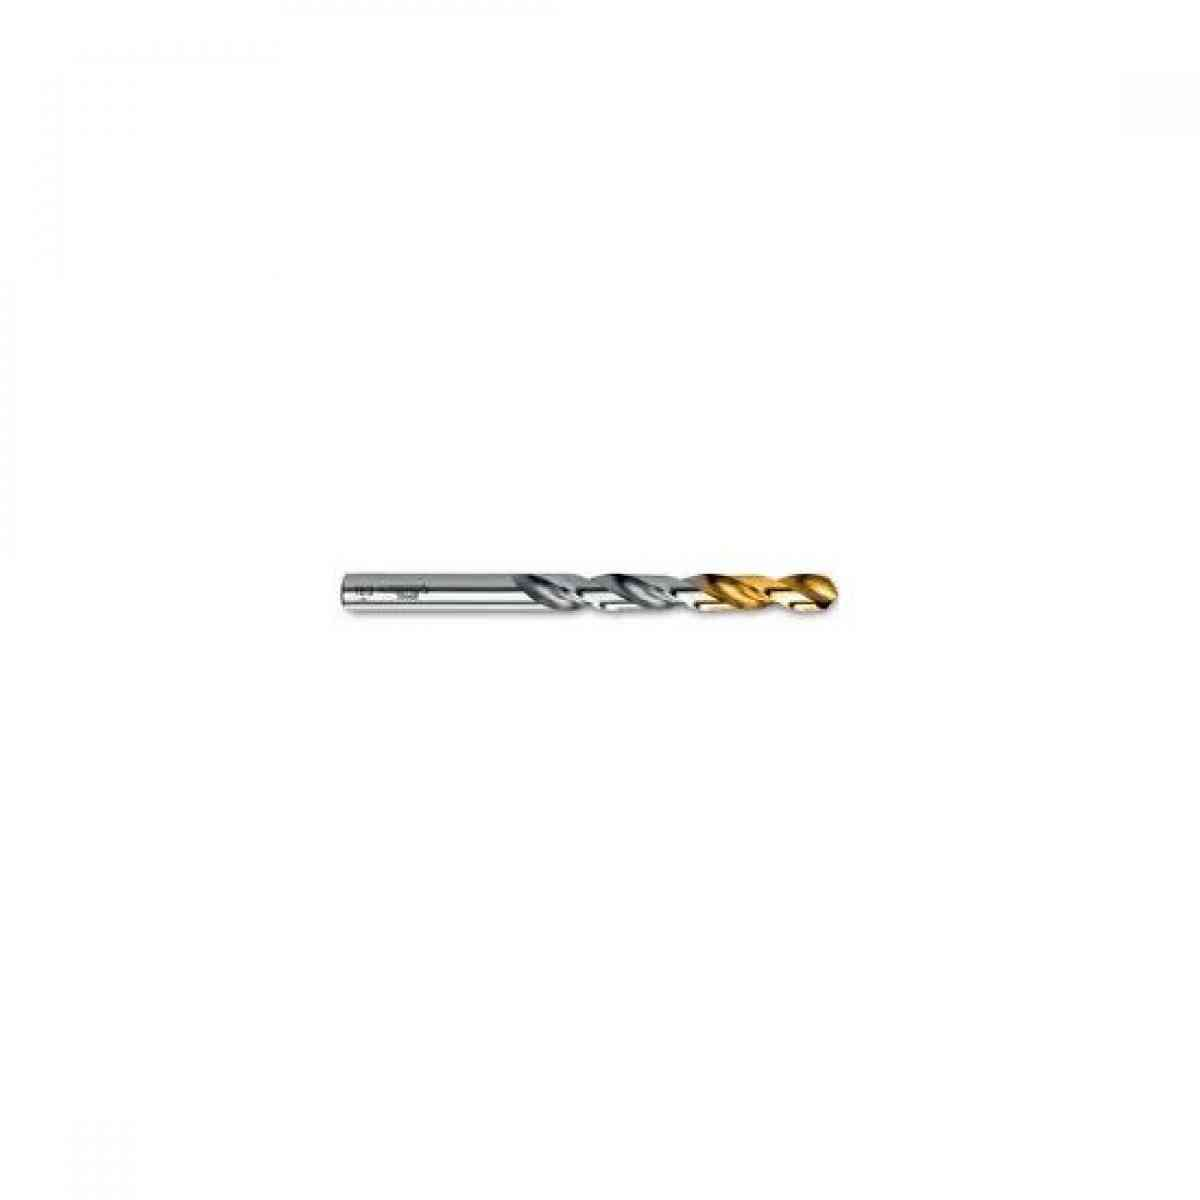 Broca Aço Rápido 4mmx75mm Revestida DIN338 TW100 Twill